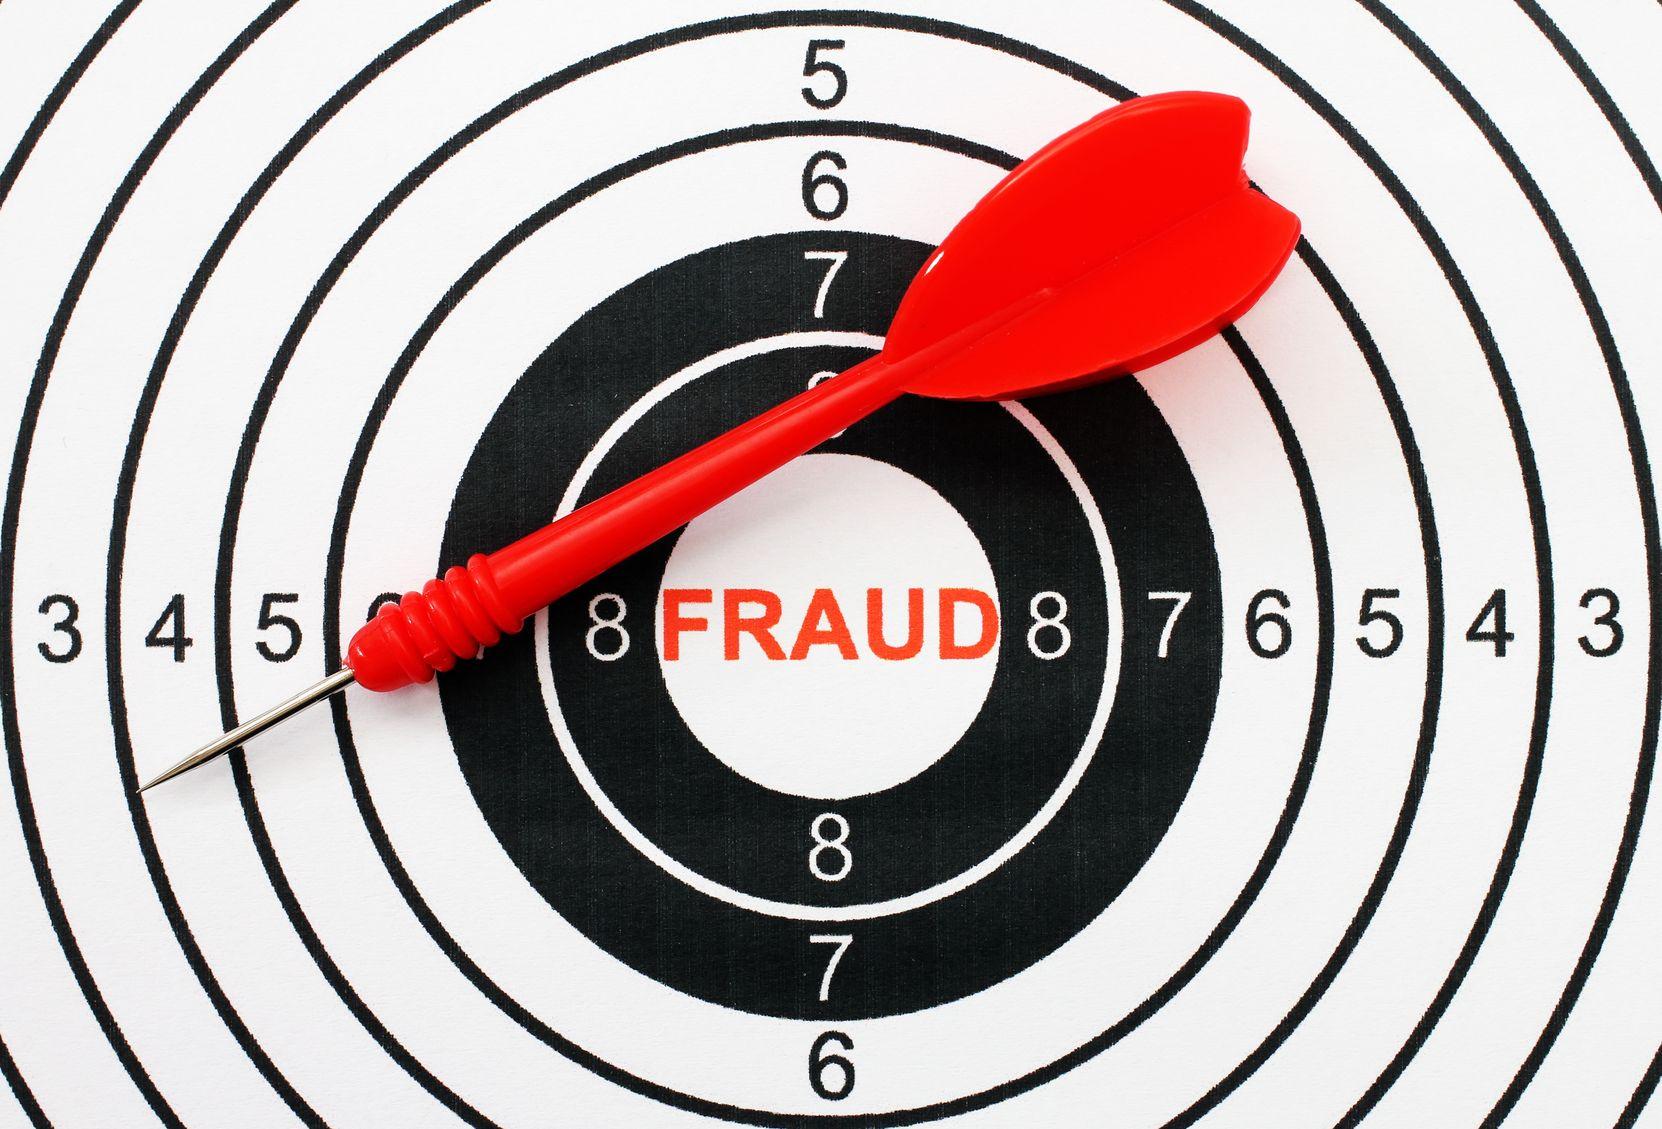 Fraud(4)